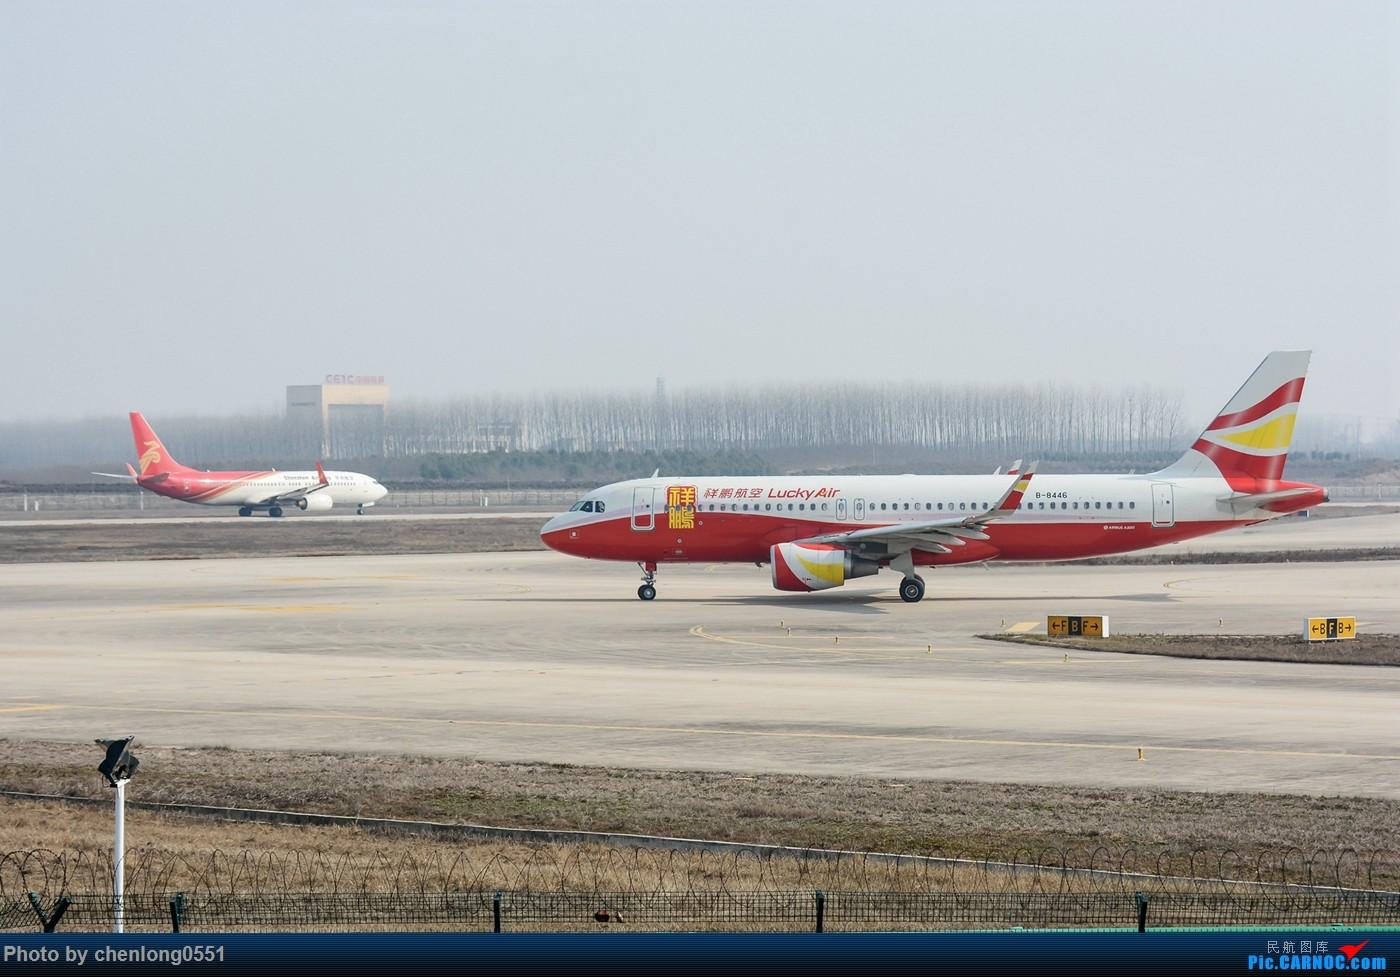 Re:【合肥飞友会·霸都打机队】好久好久没发图了,发几个19年年会的照片,几乎都是没见过的机 AIRBUS A320-200 B-8446 中国合肥新桥国际机场